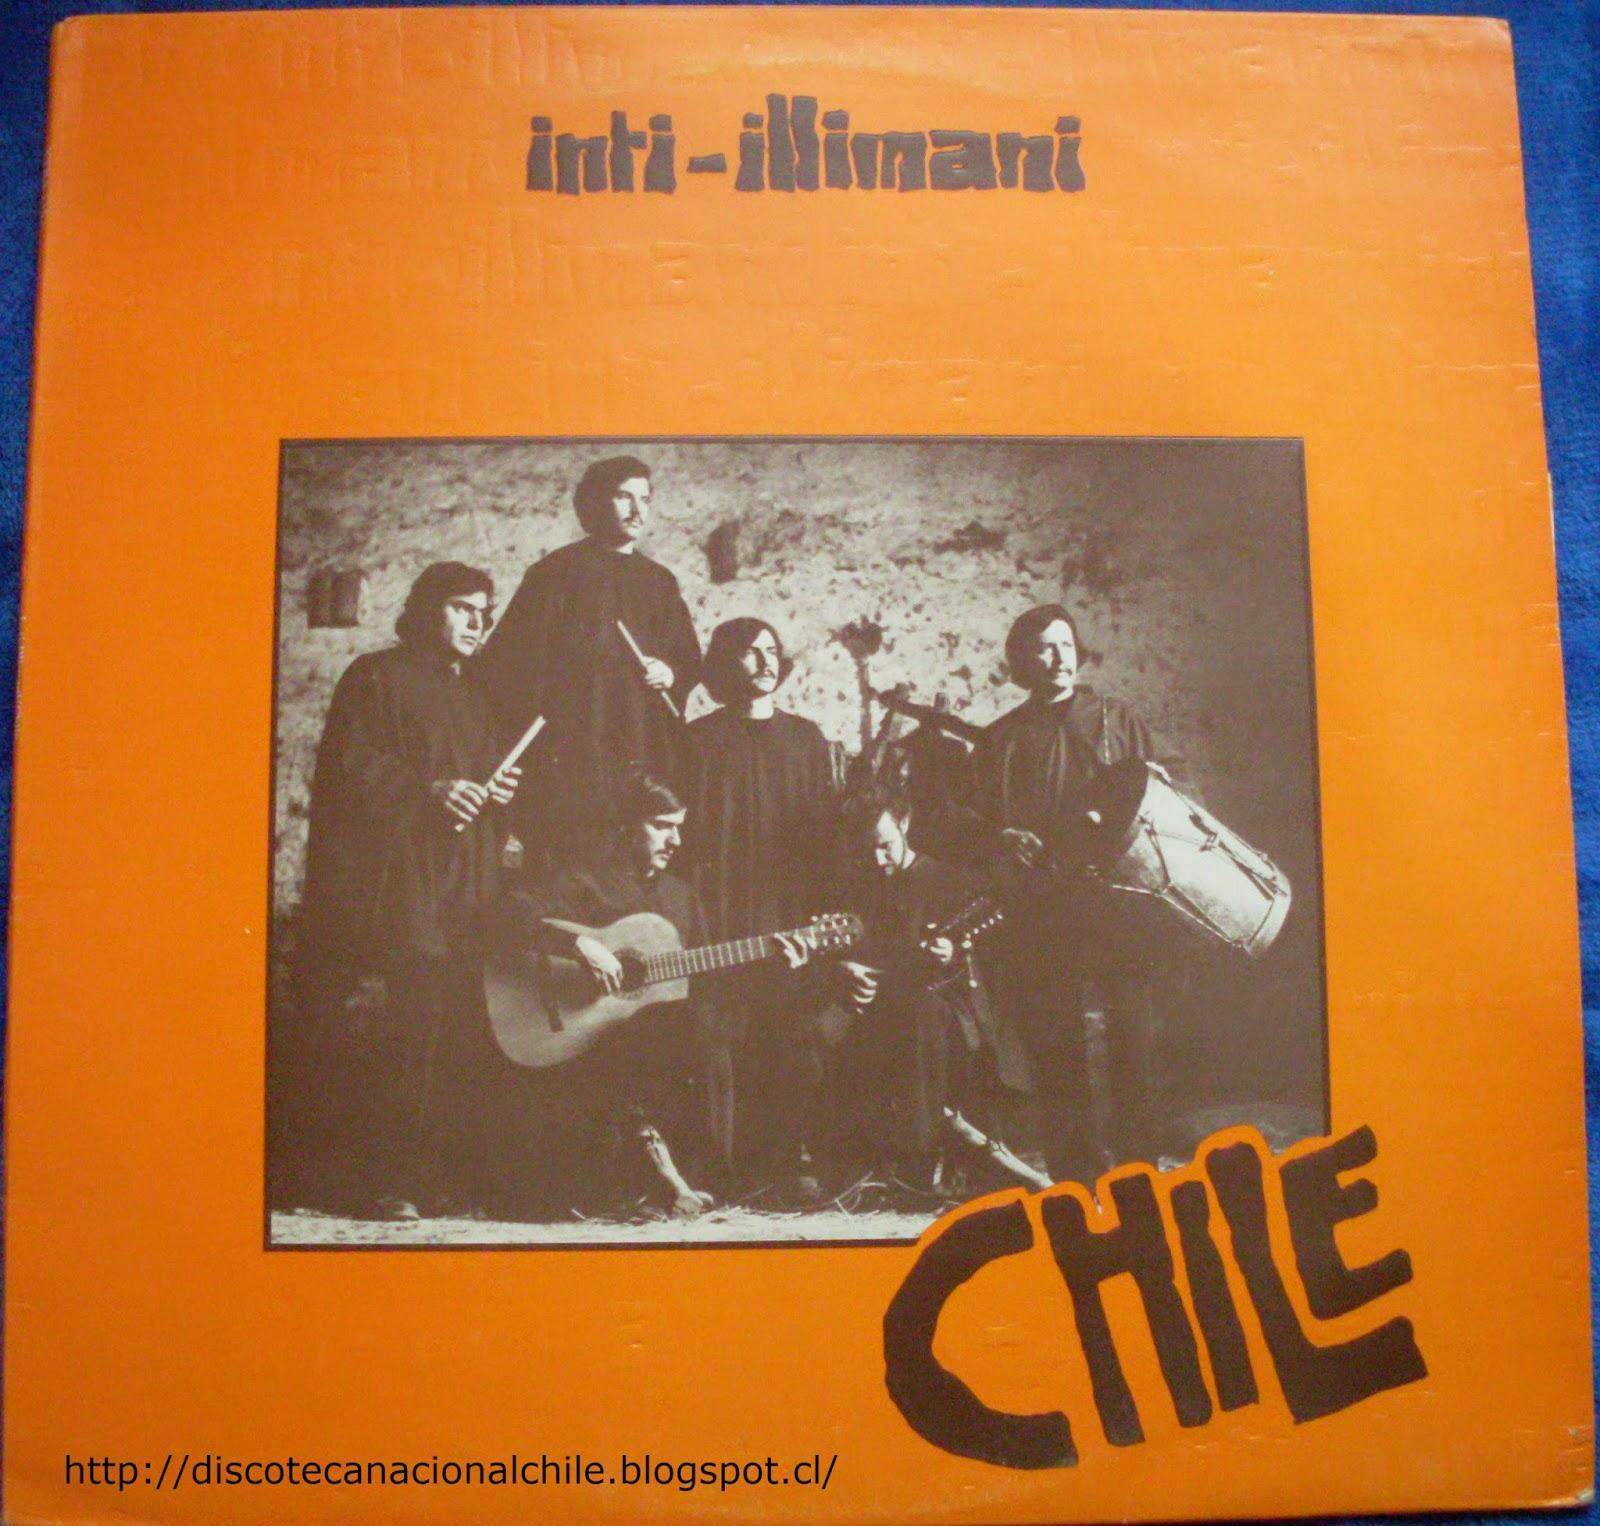 Discoteca Nacional Chile: Inti Illimani: Chile. XTRA 1152 ...